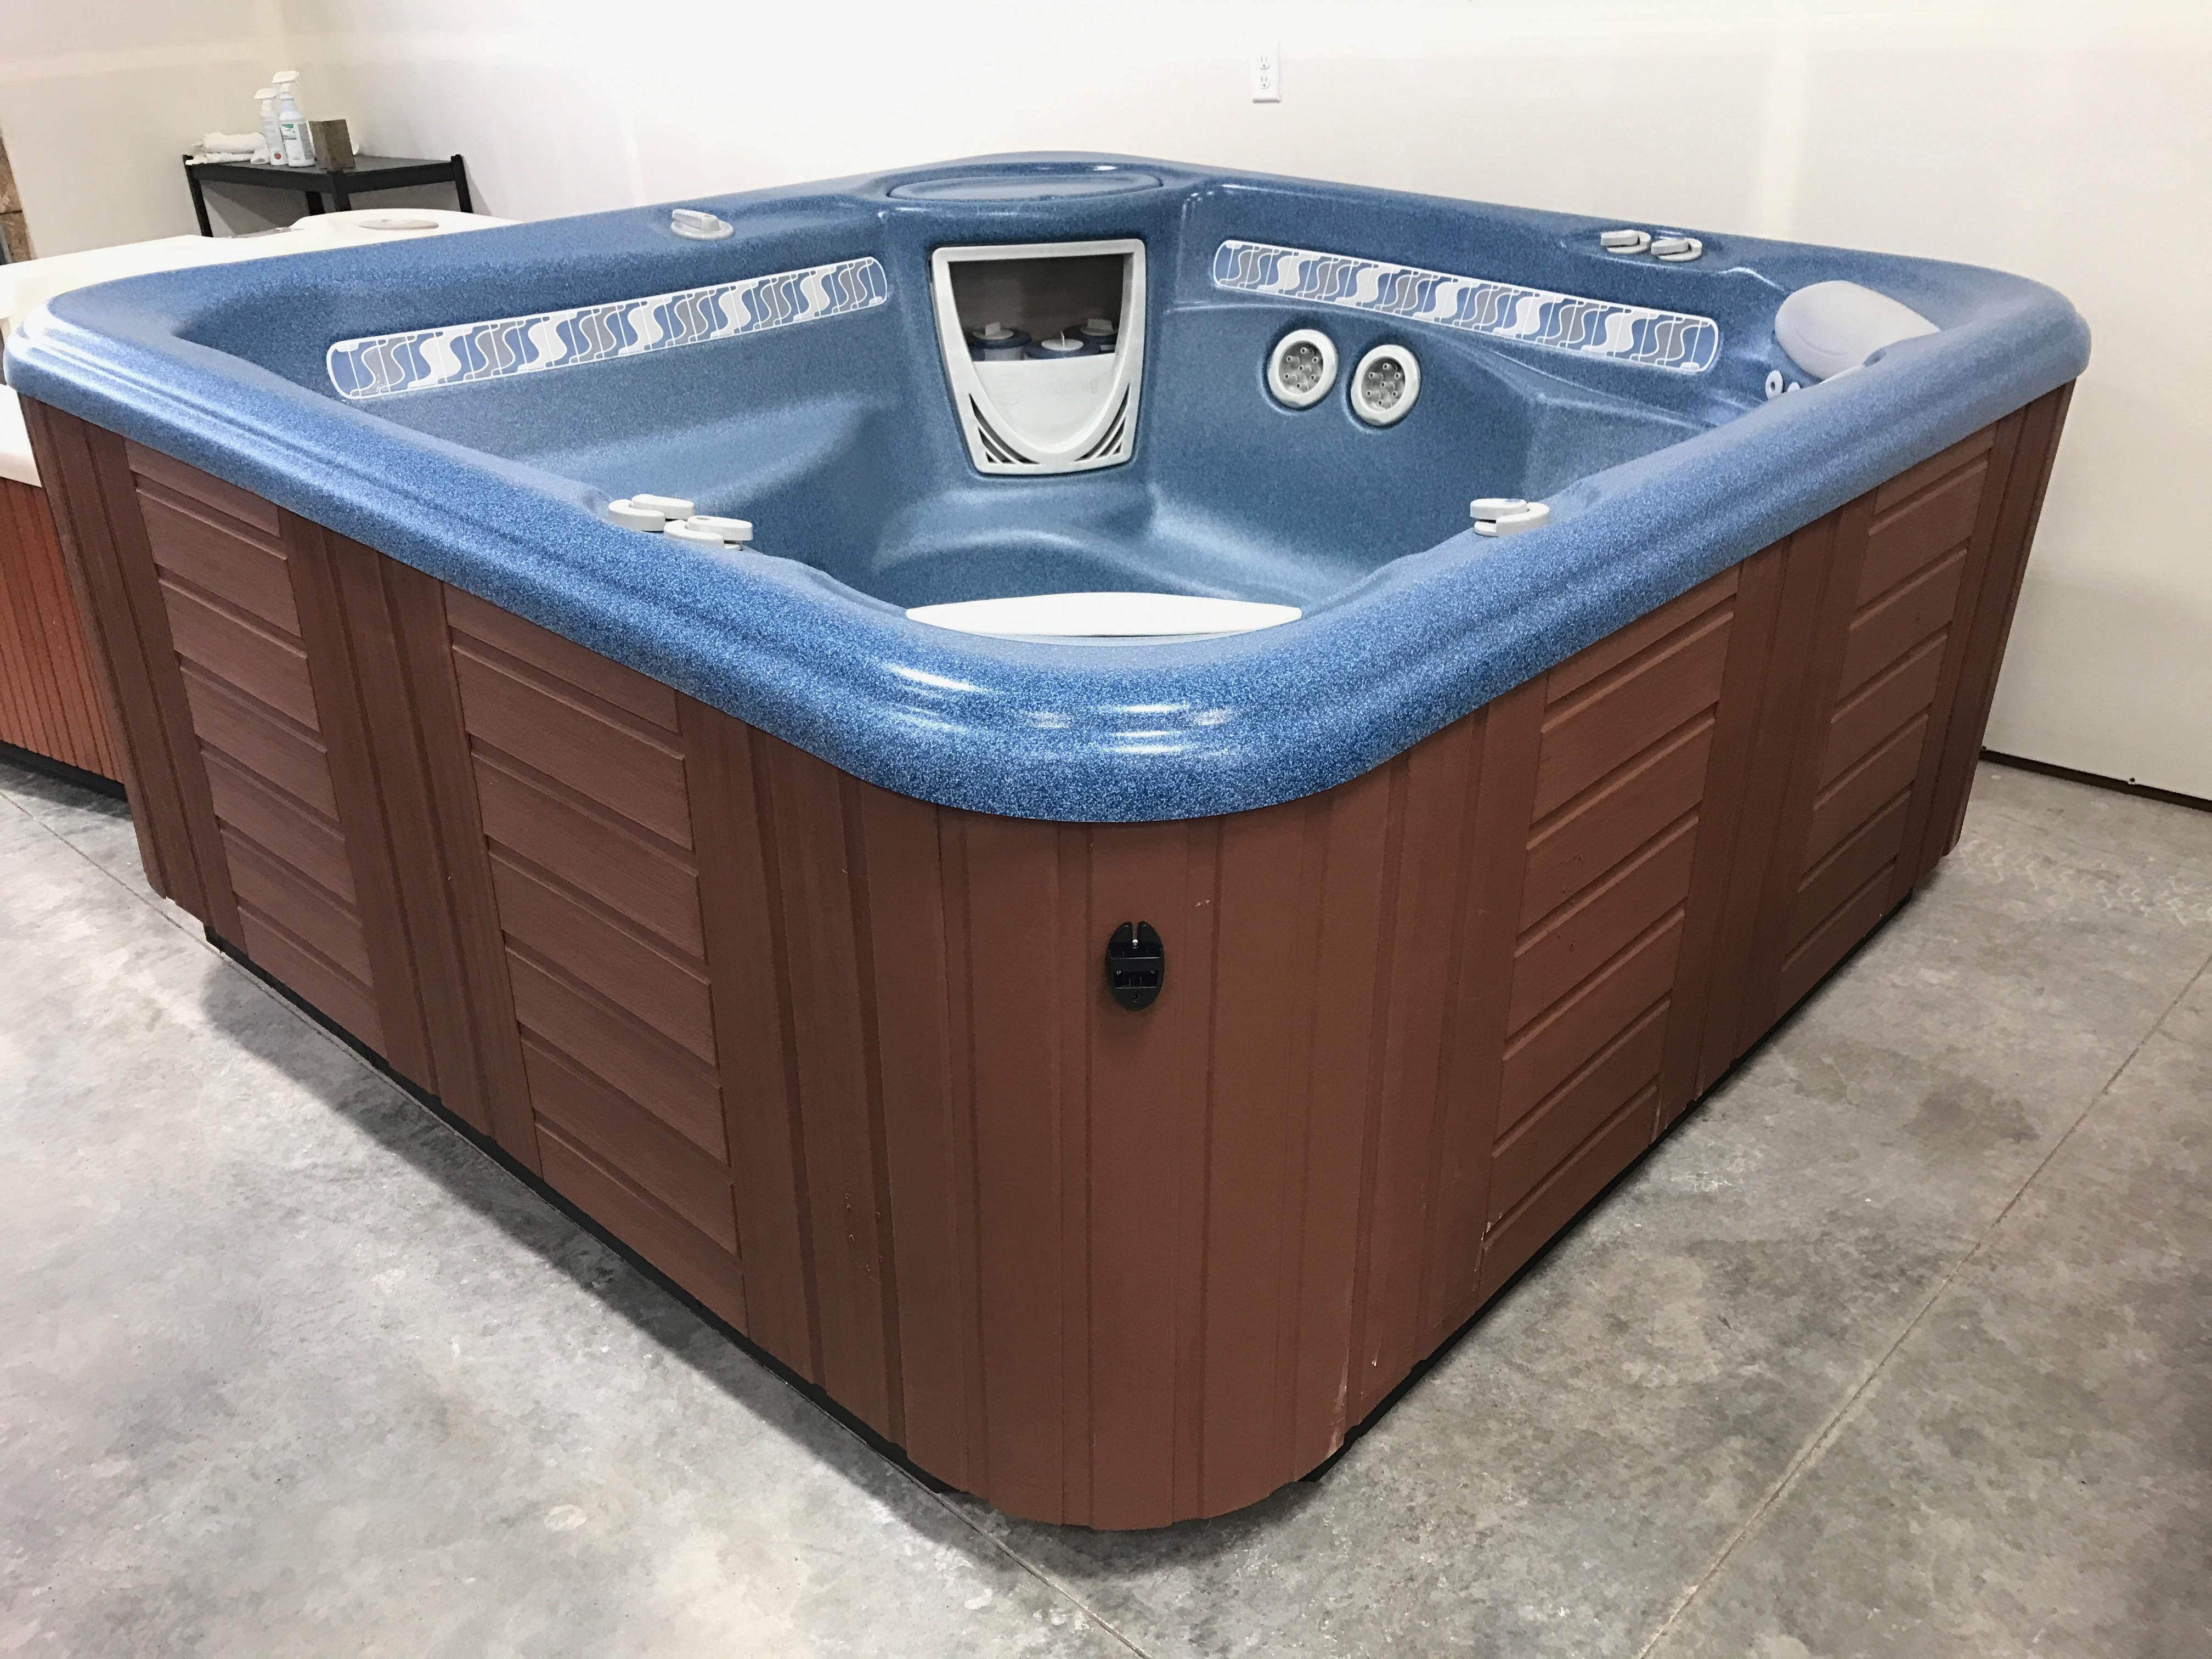 $3995 - 2001 HotSprings Vanguard (6-Person) - Mountain Hot Tub